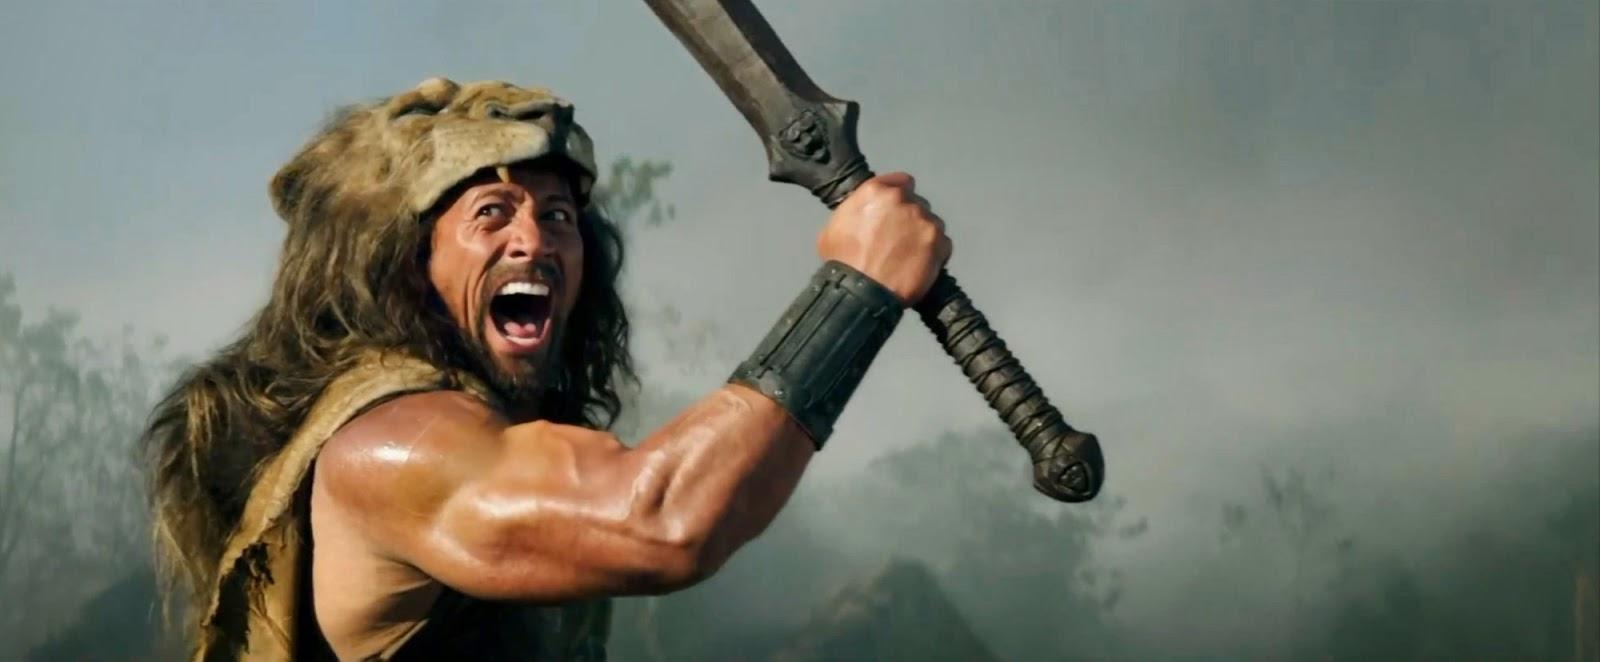 The Champion of Men: Hercules the Hollow Humanitarian